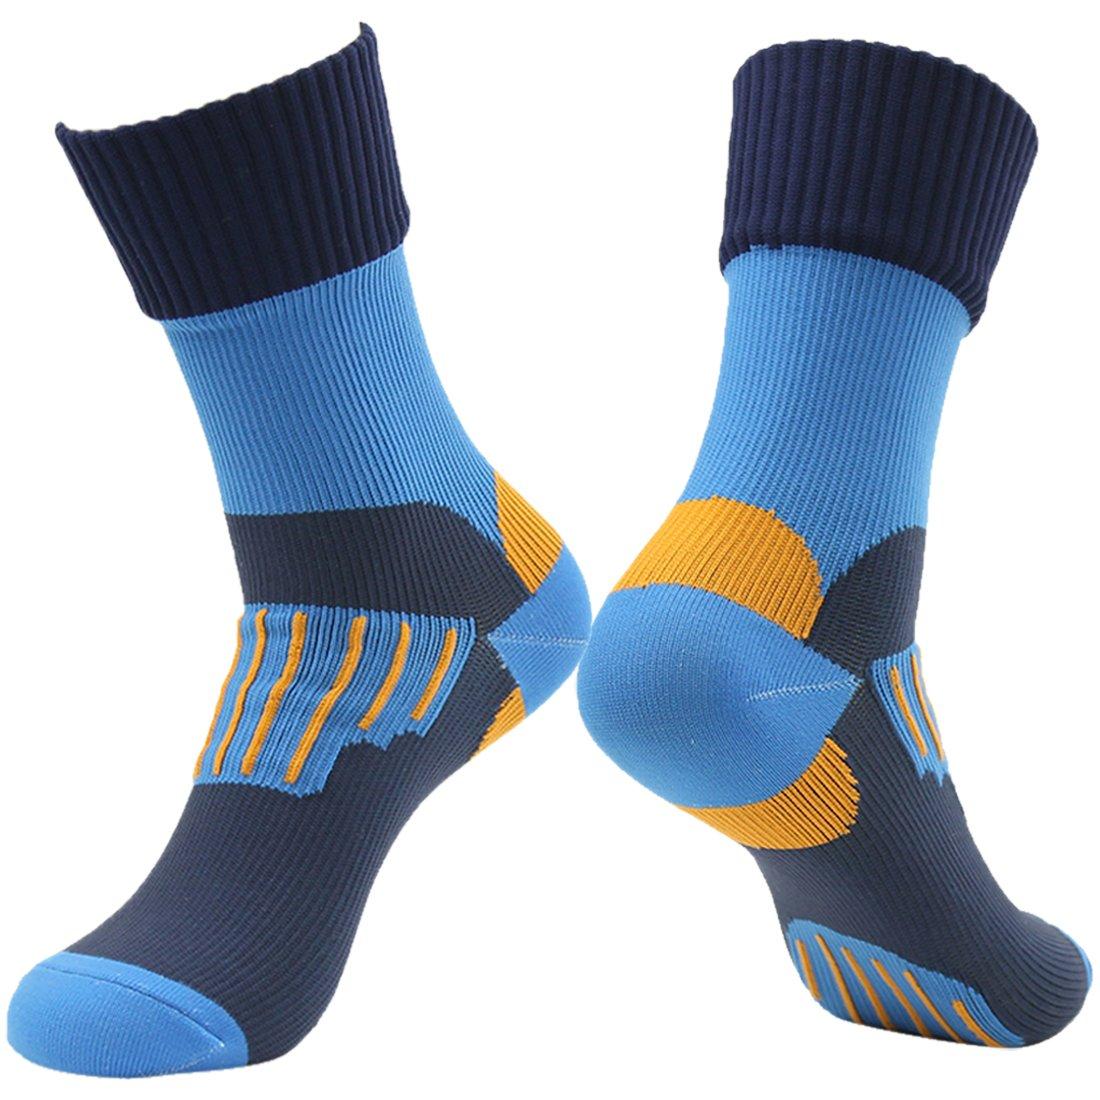 Athletic Running Socks for Women, Waterproof Cycling RANDY SUN Men's Breathable Ventilated Cushioned Quarter Trekking Socks XS by RANDY SUN